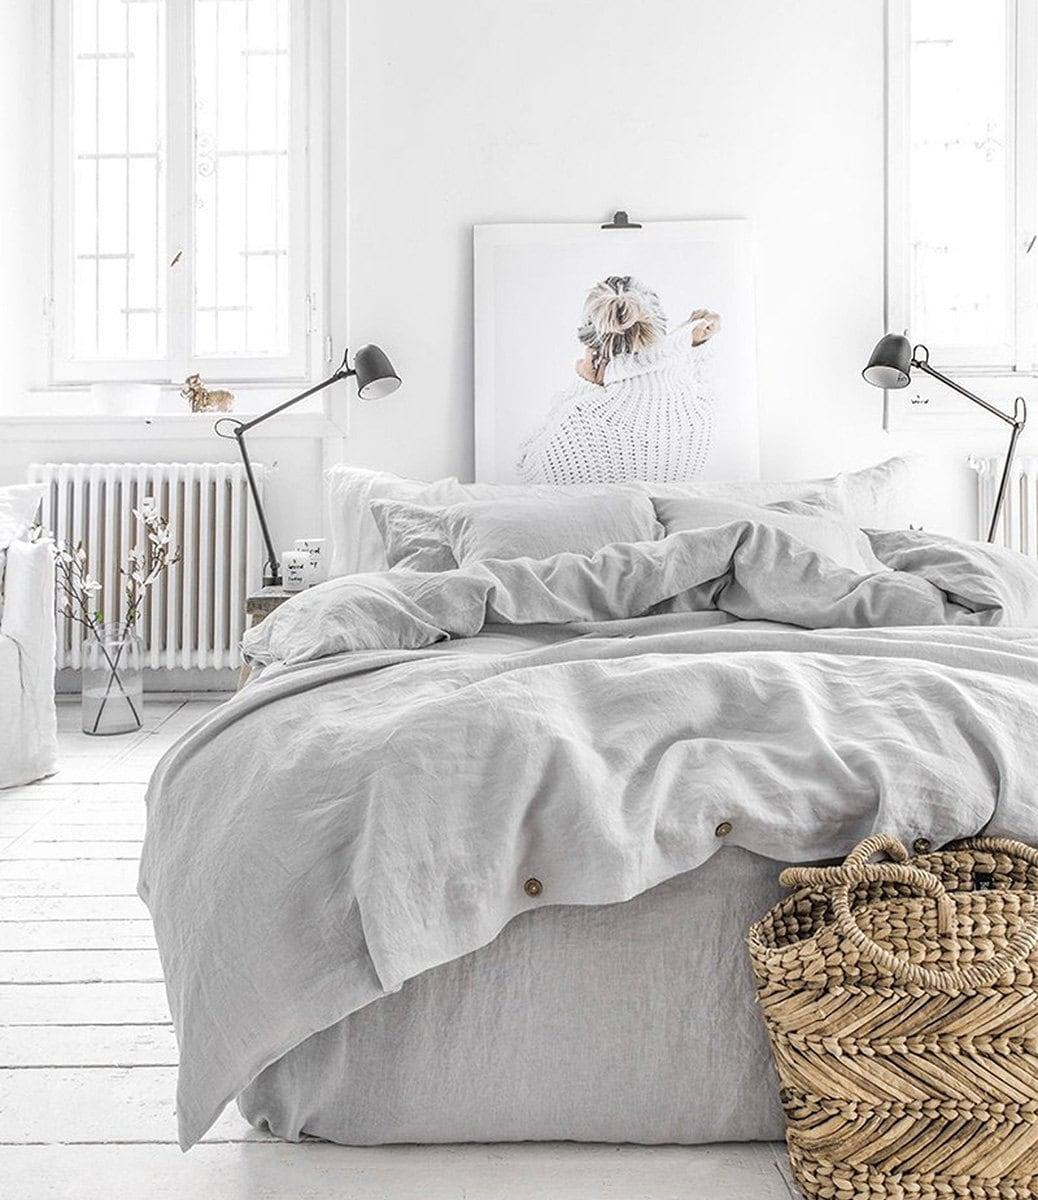 Custom bedding from Etsy